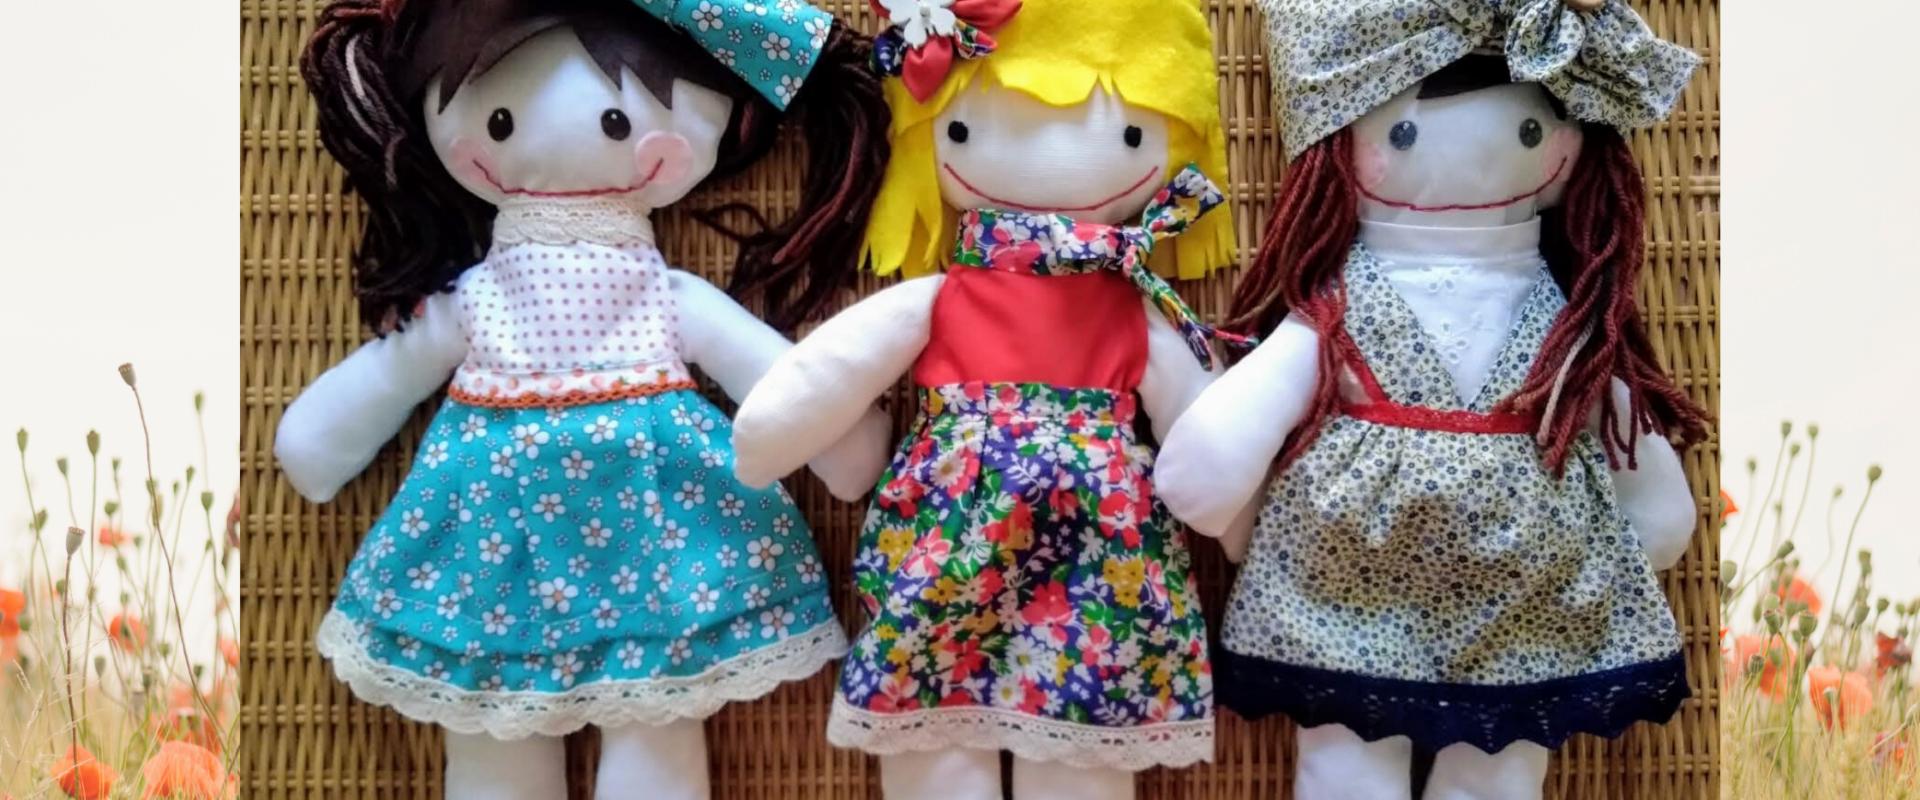 bambole di pezza buffambole